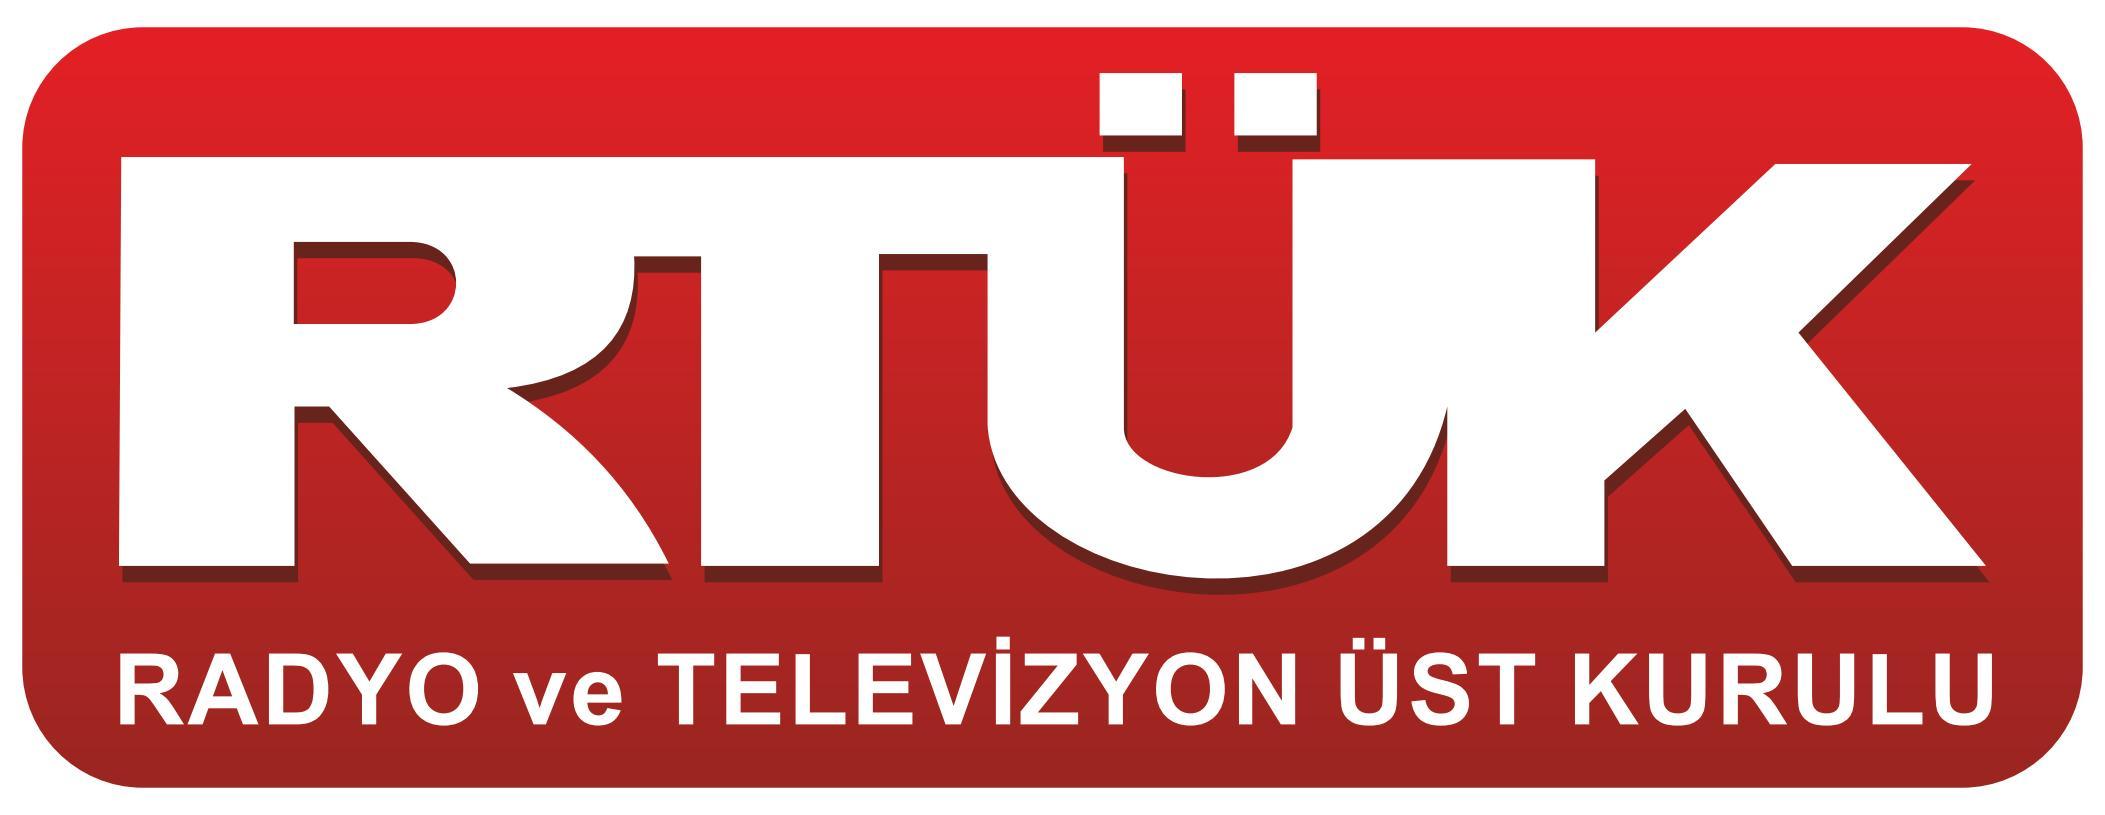 RTÜK   Radyo ve Televizyon Üst Kurulu Vektörel Logosu [EPS File] png